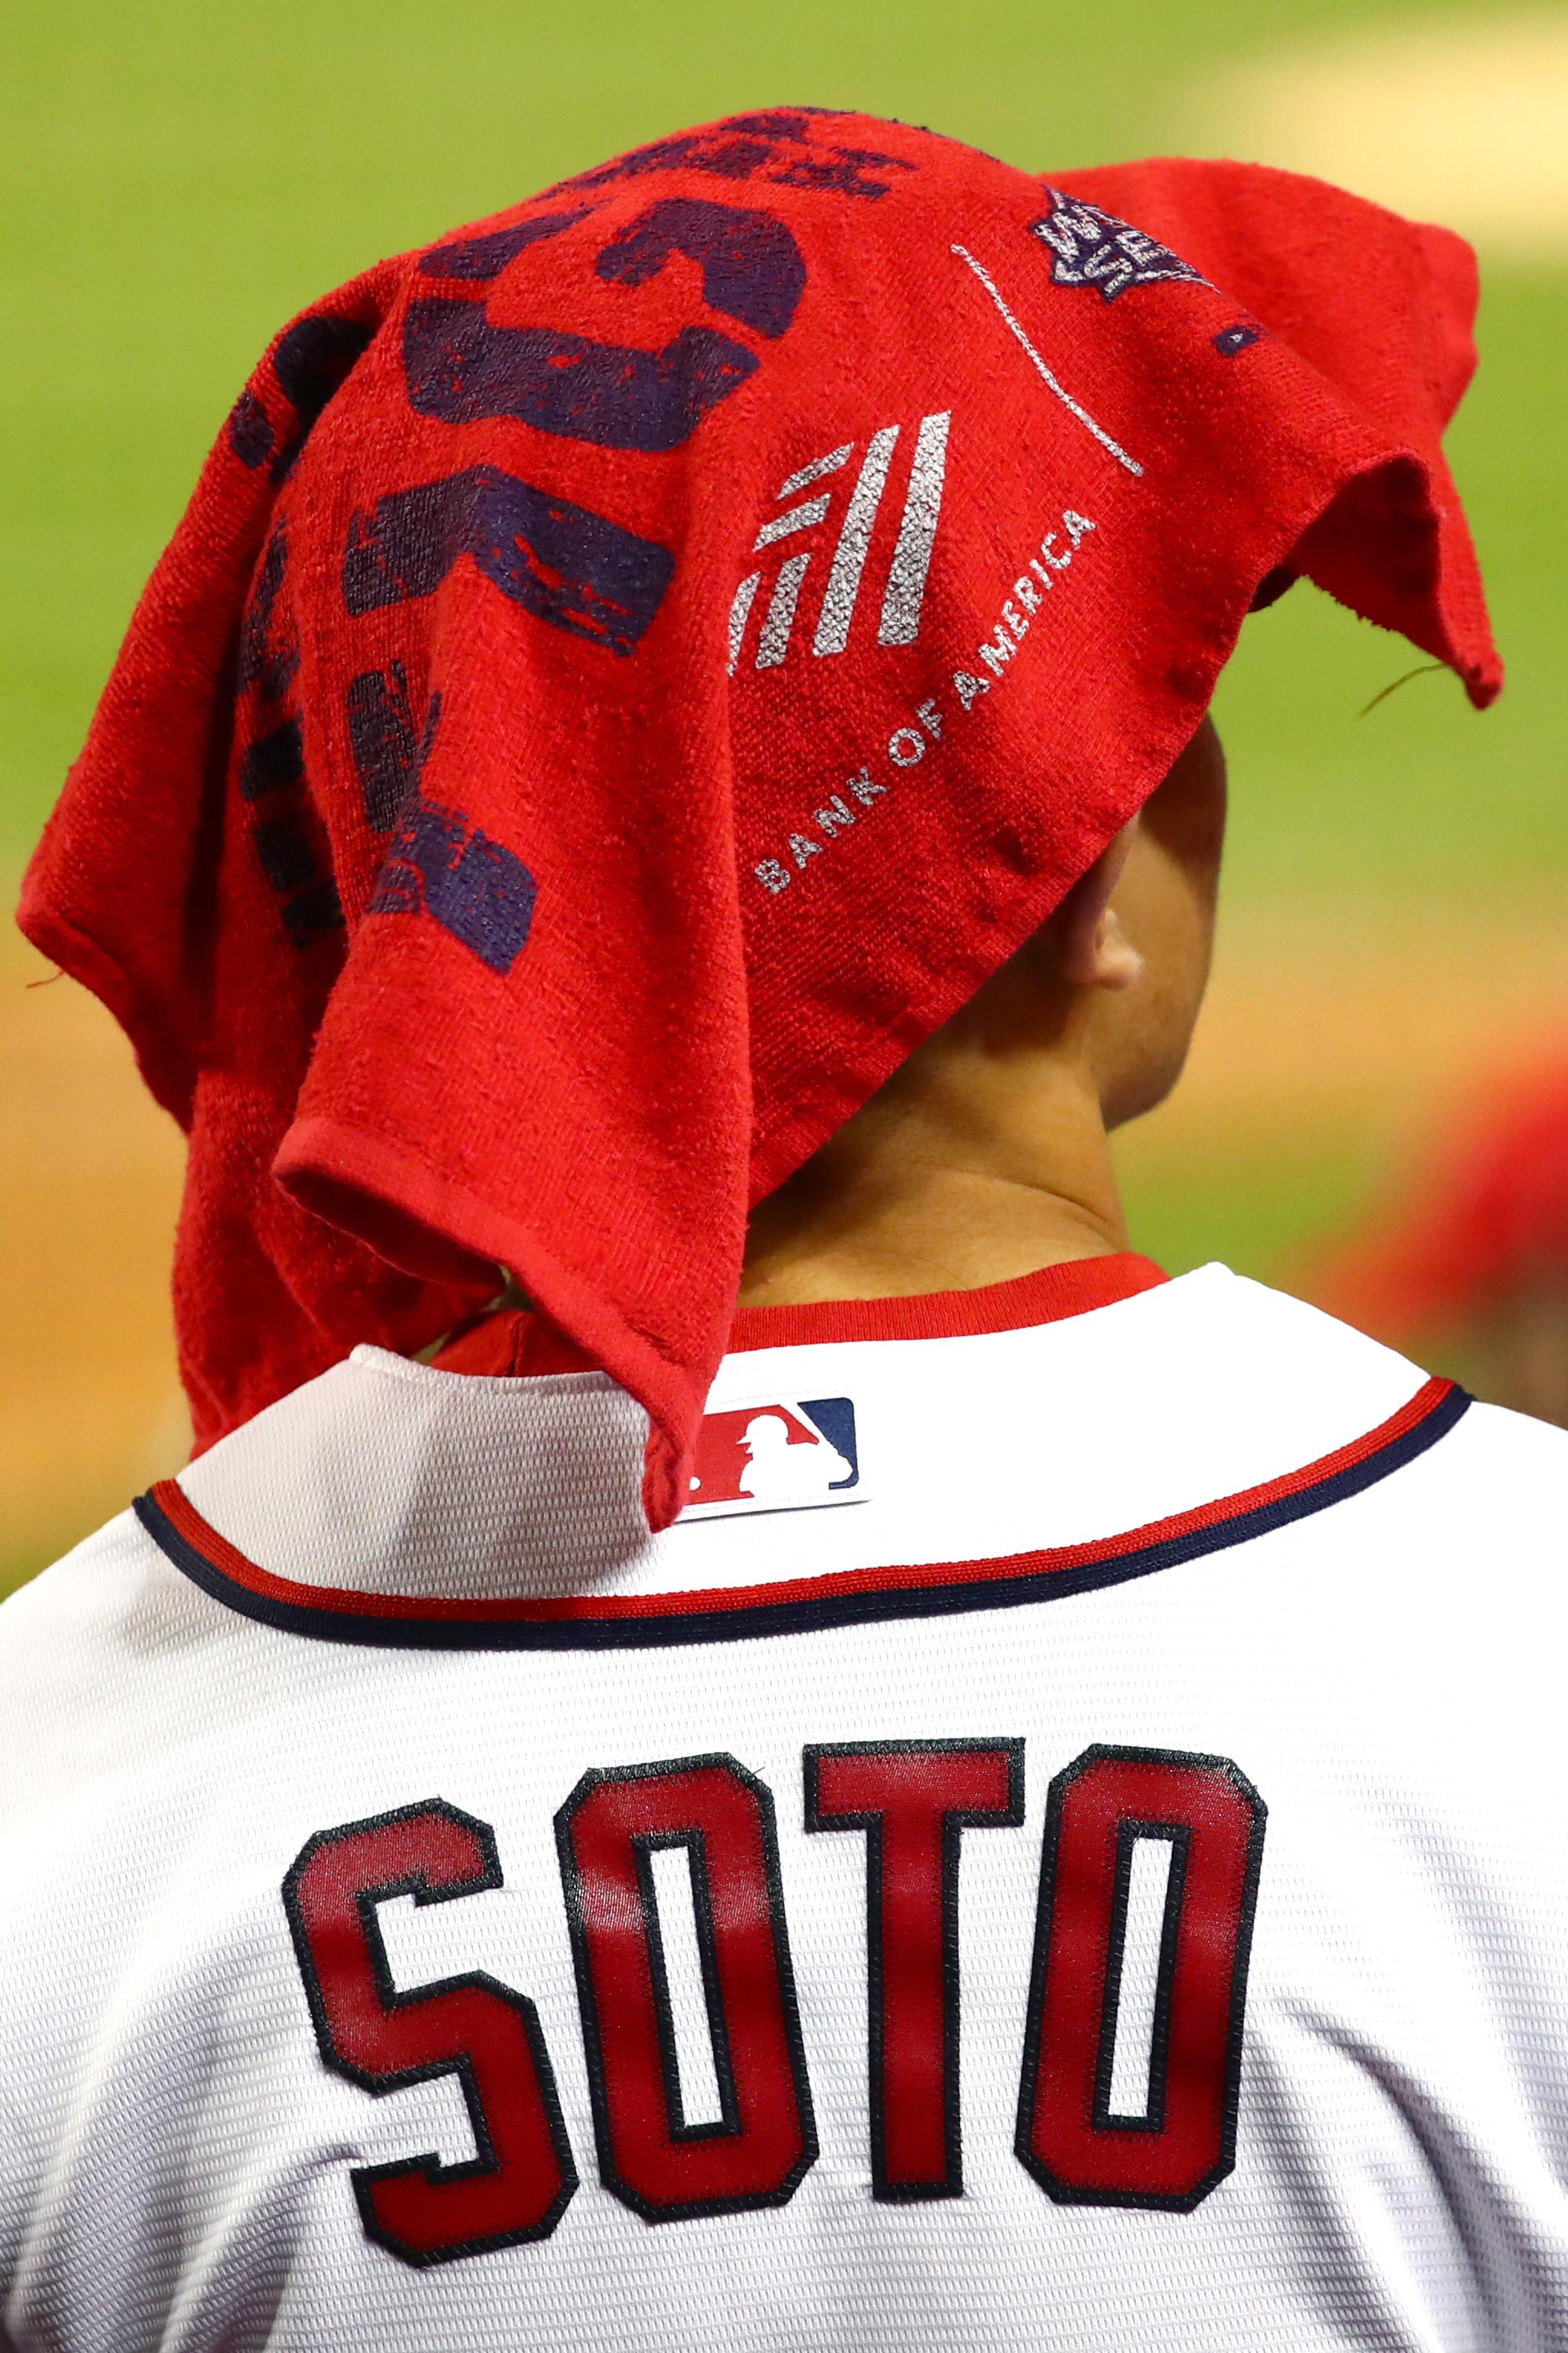 2019 World Series Game 3 - Houston Astros v. Washington Nationals